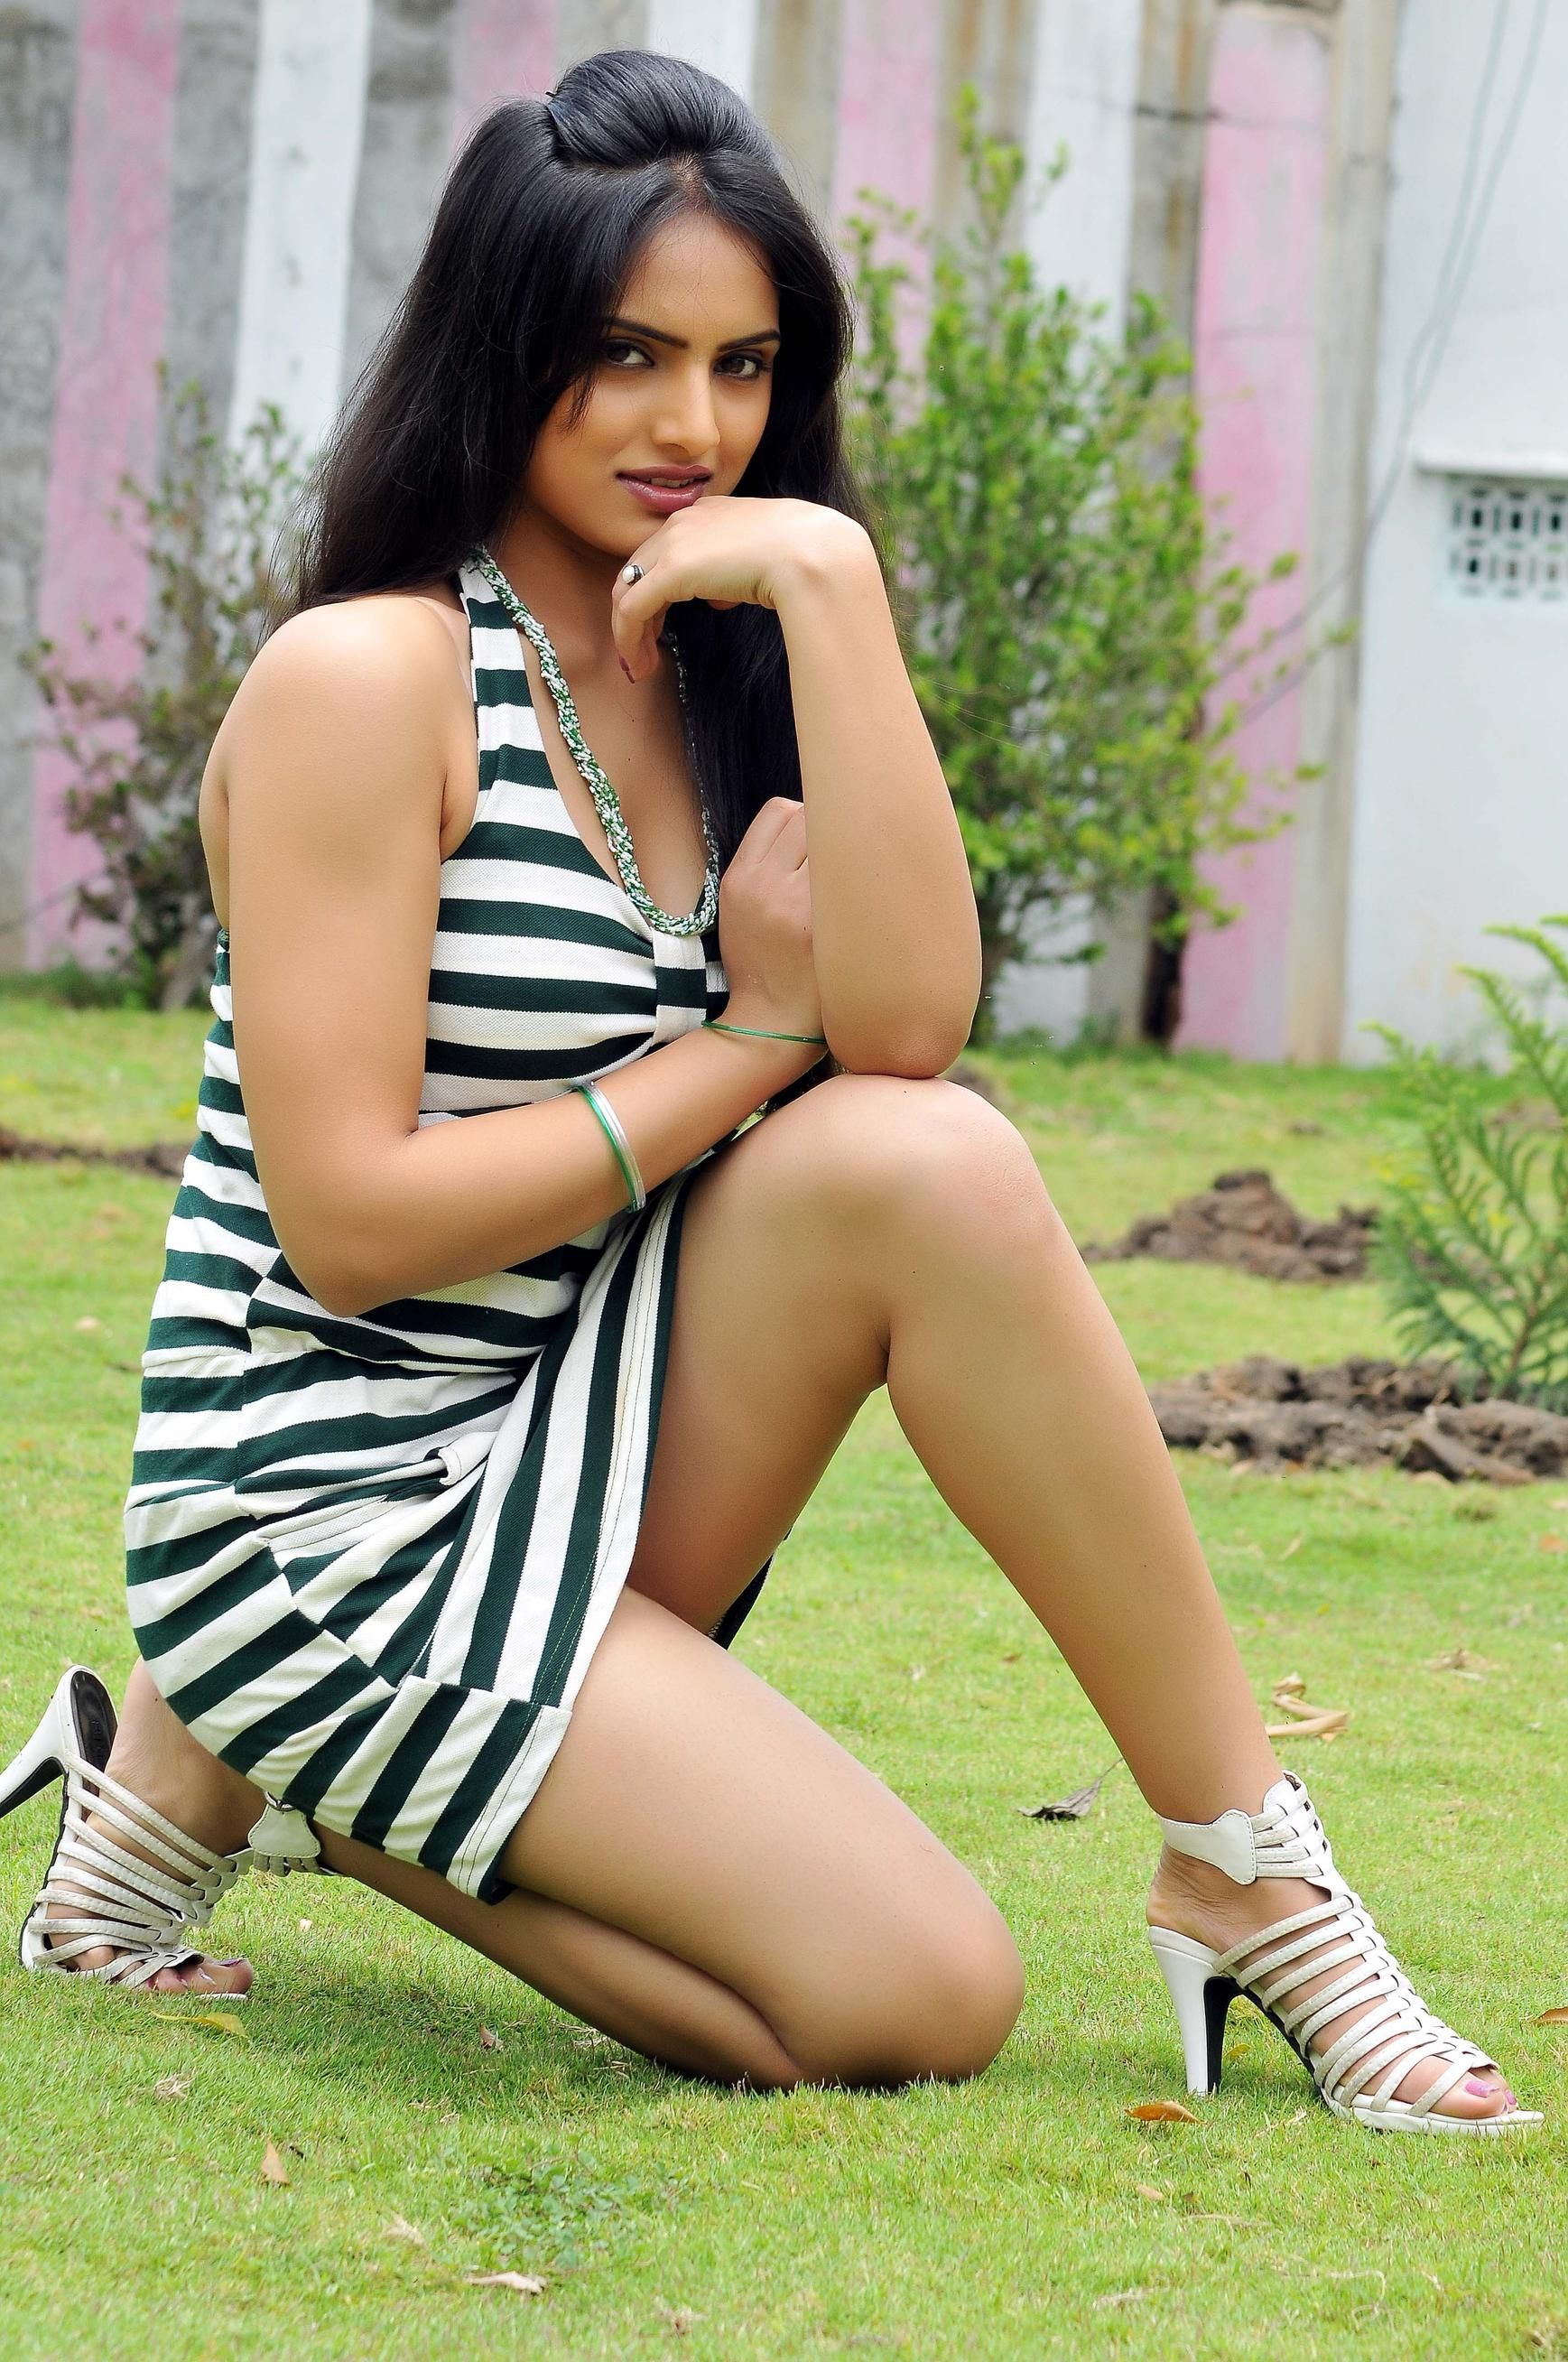 Telugu celebrity actress anchors hot spicy exposing back saree bikini photo shoots wardrobe rare pics